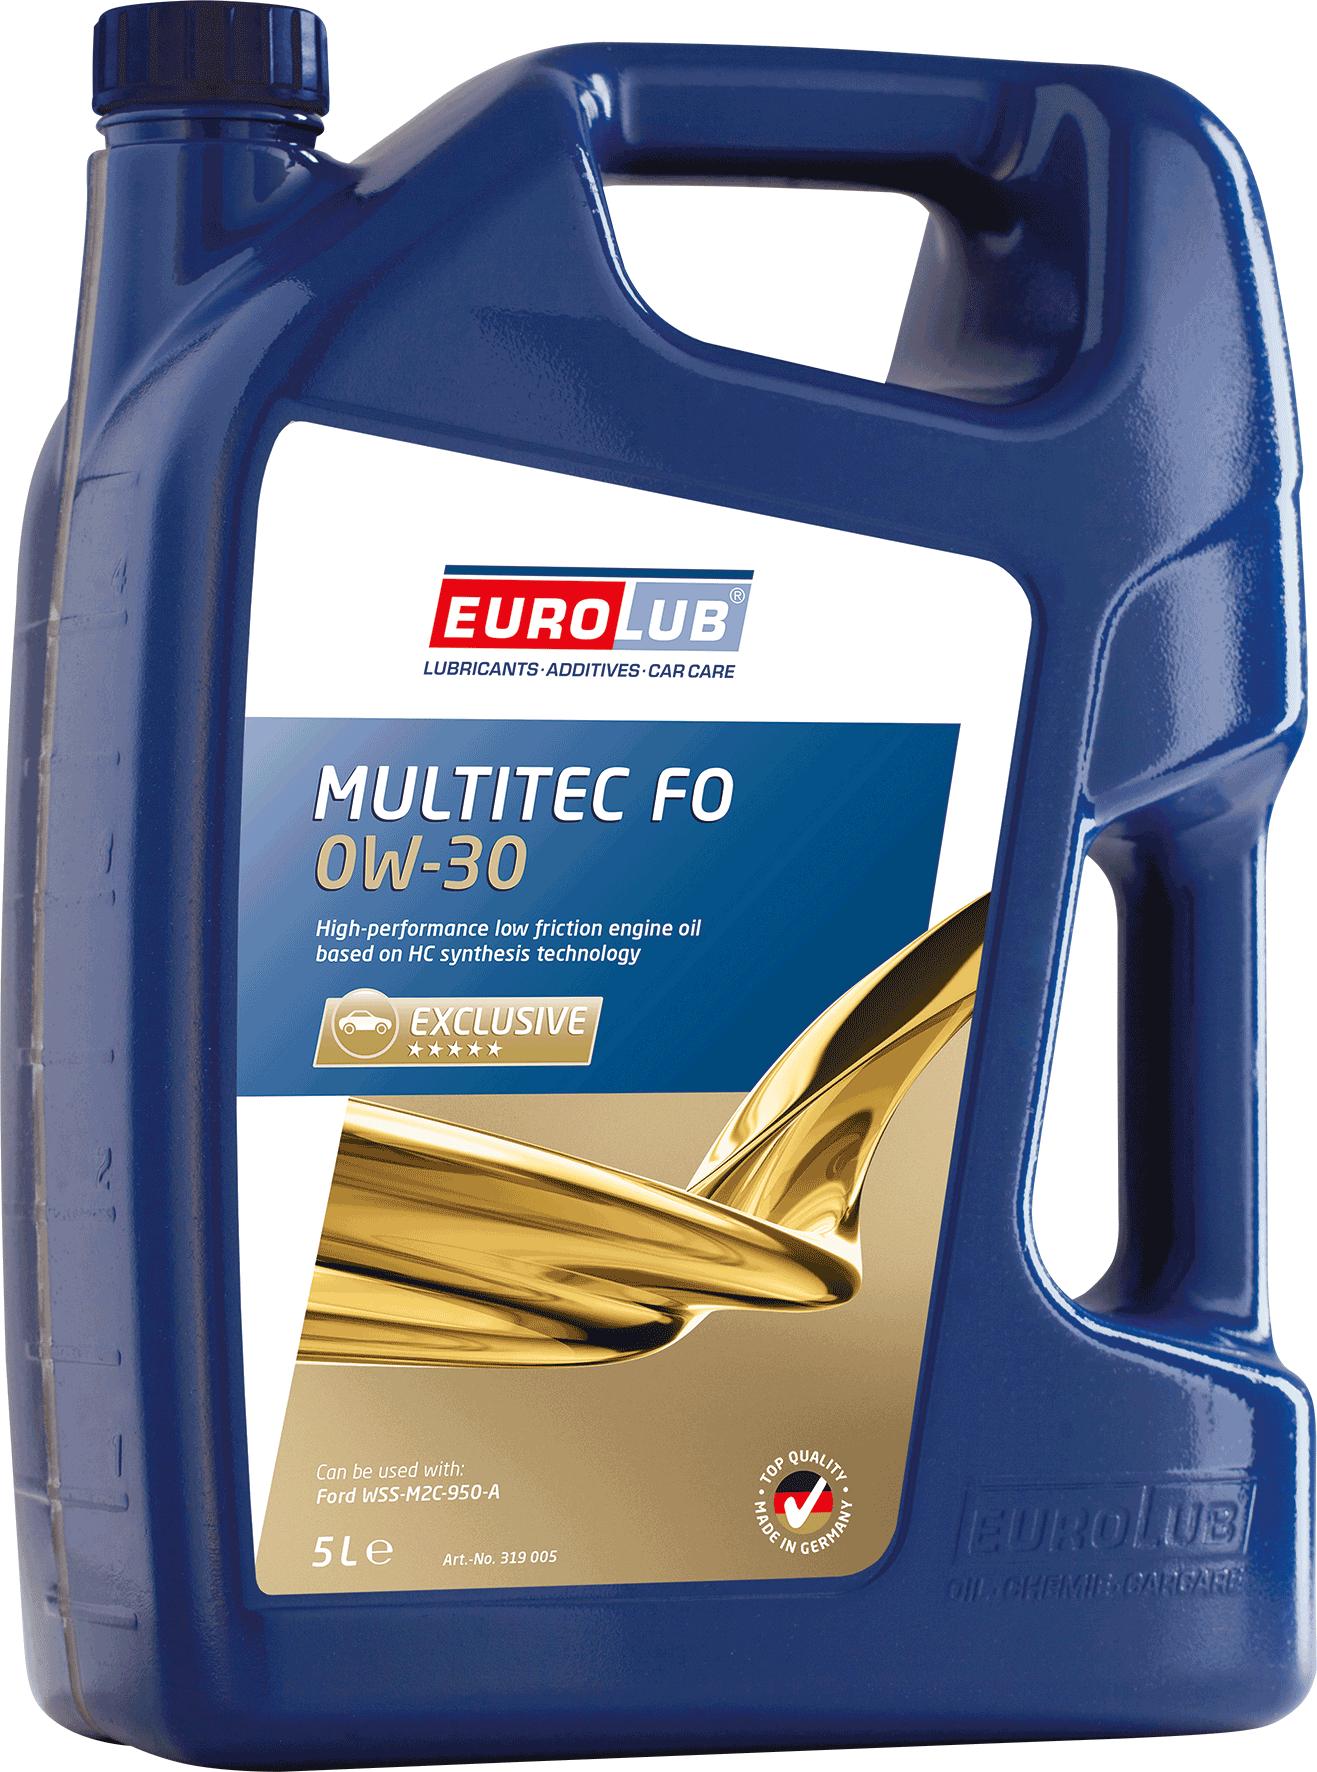 EUROLUB ECO MULTITEC FO SAE 0W/30 (синтетическое, Mid SAPS), 5л